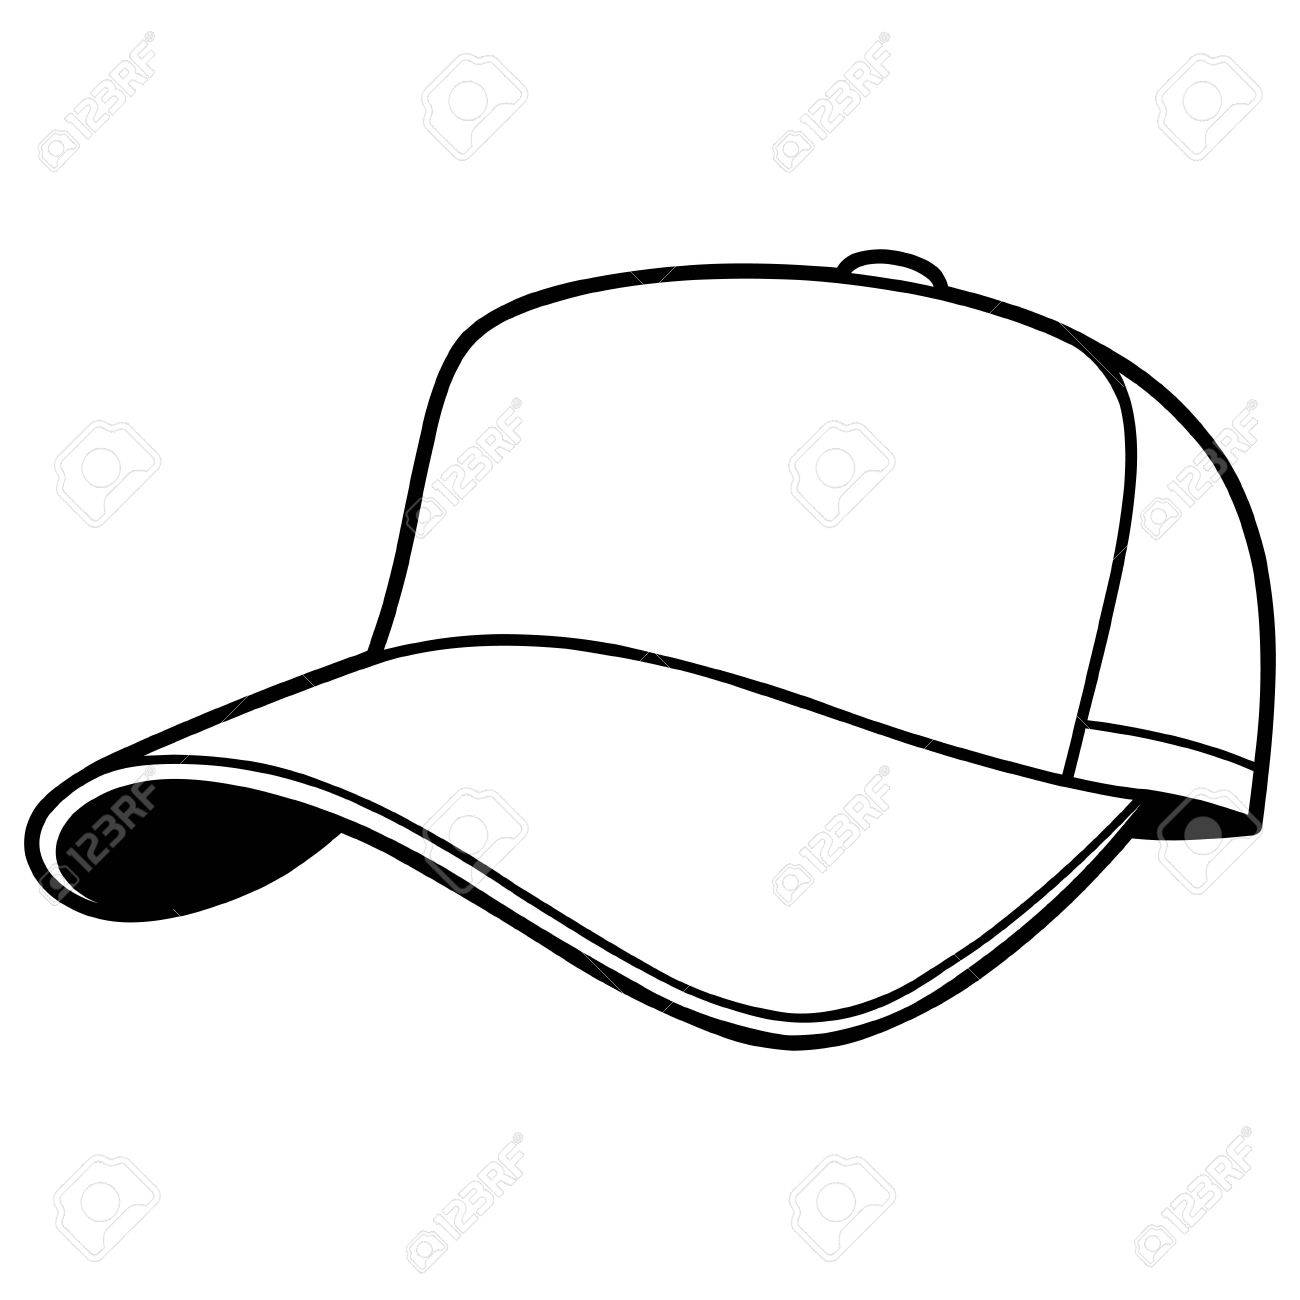 baseball cap illustration royalty free cliparts vectors and stock rh 123rf com baseball hat vector art blank baseball hat vector